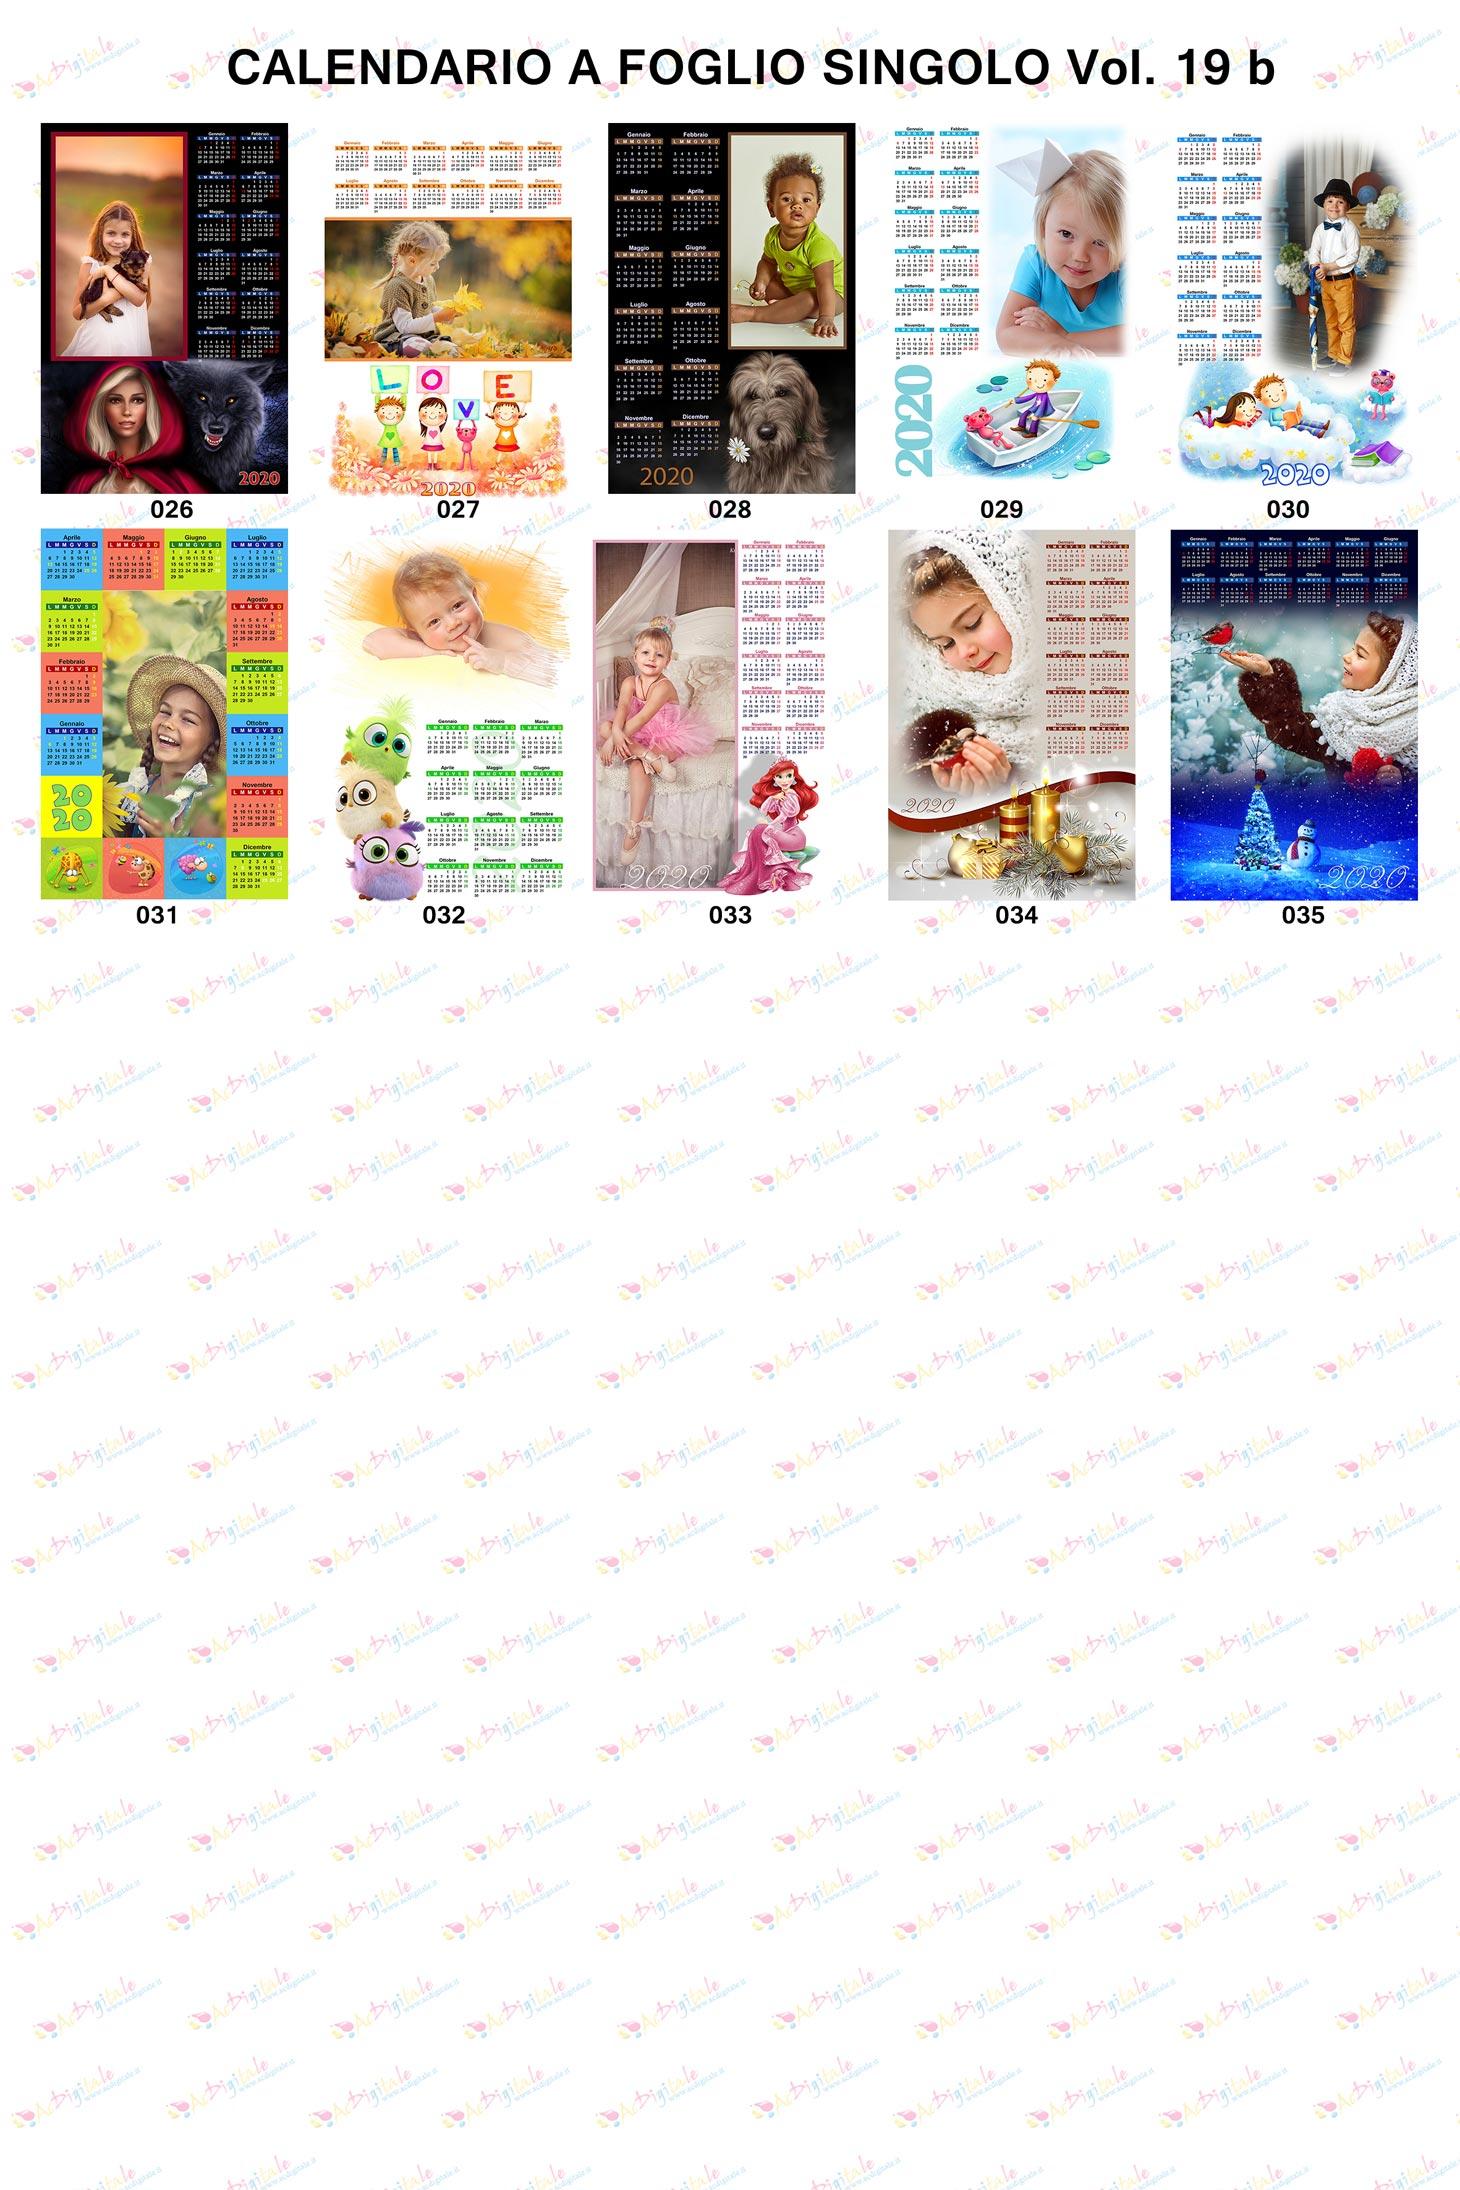 Anteprima Calendari personalizzati volume 19b